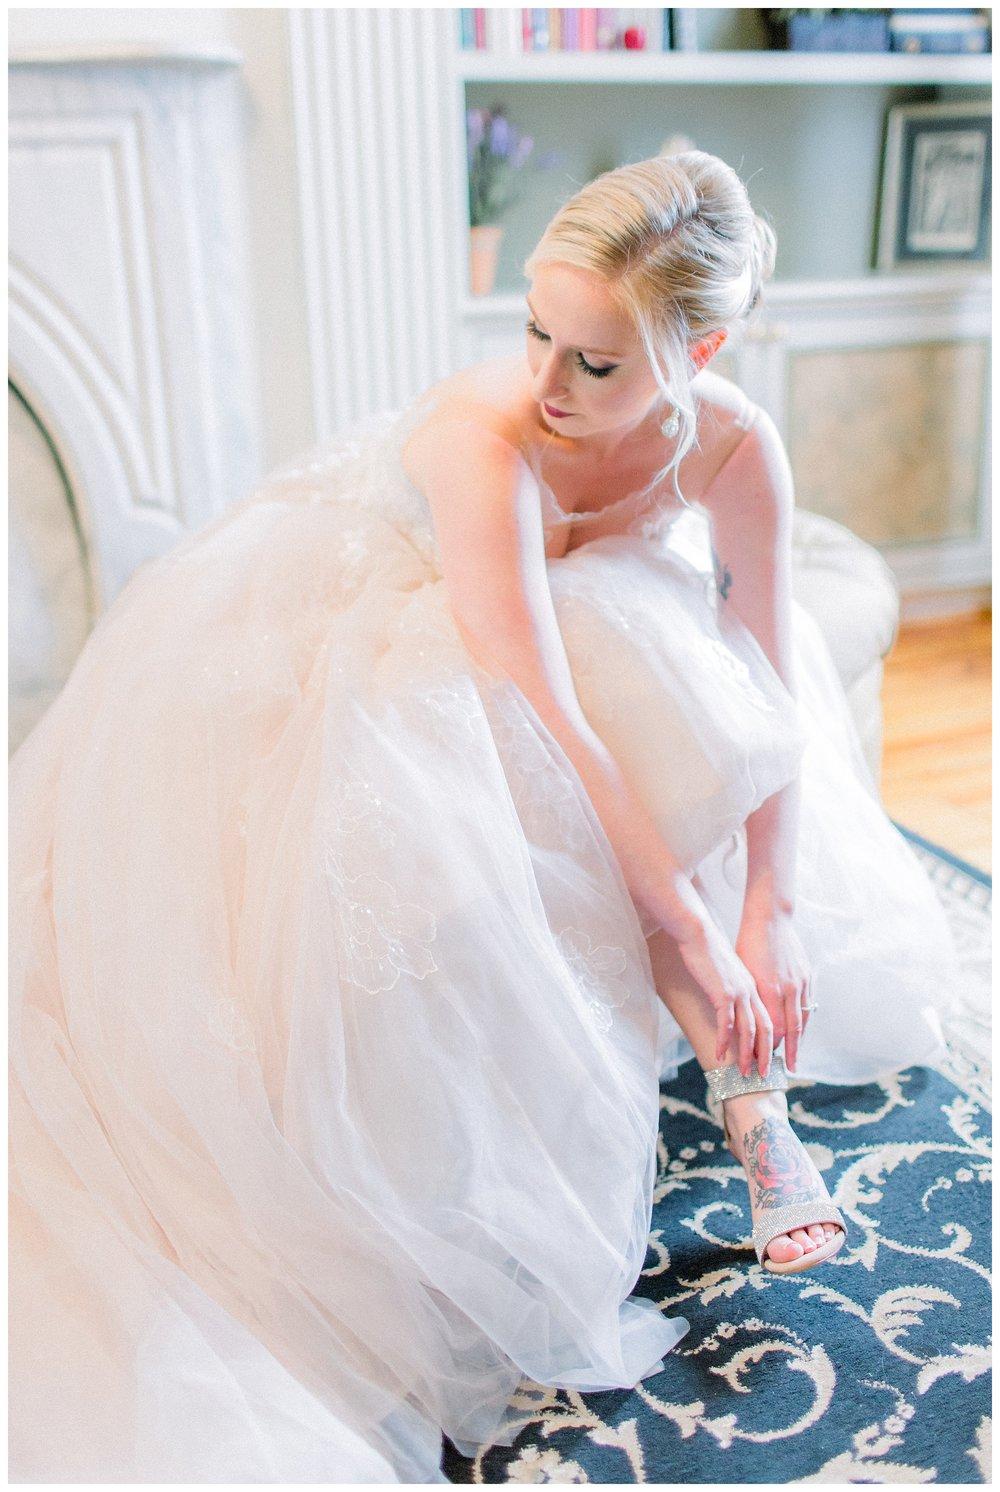 Whitehall Estate Wedding | Northern Virginia Wedding Photographer Kir Tuben_0021.jpg